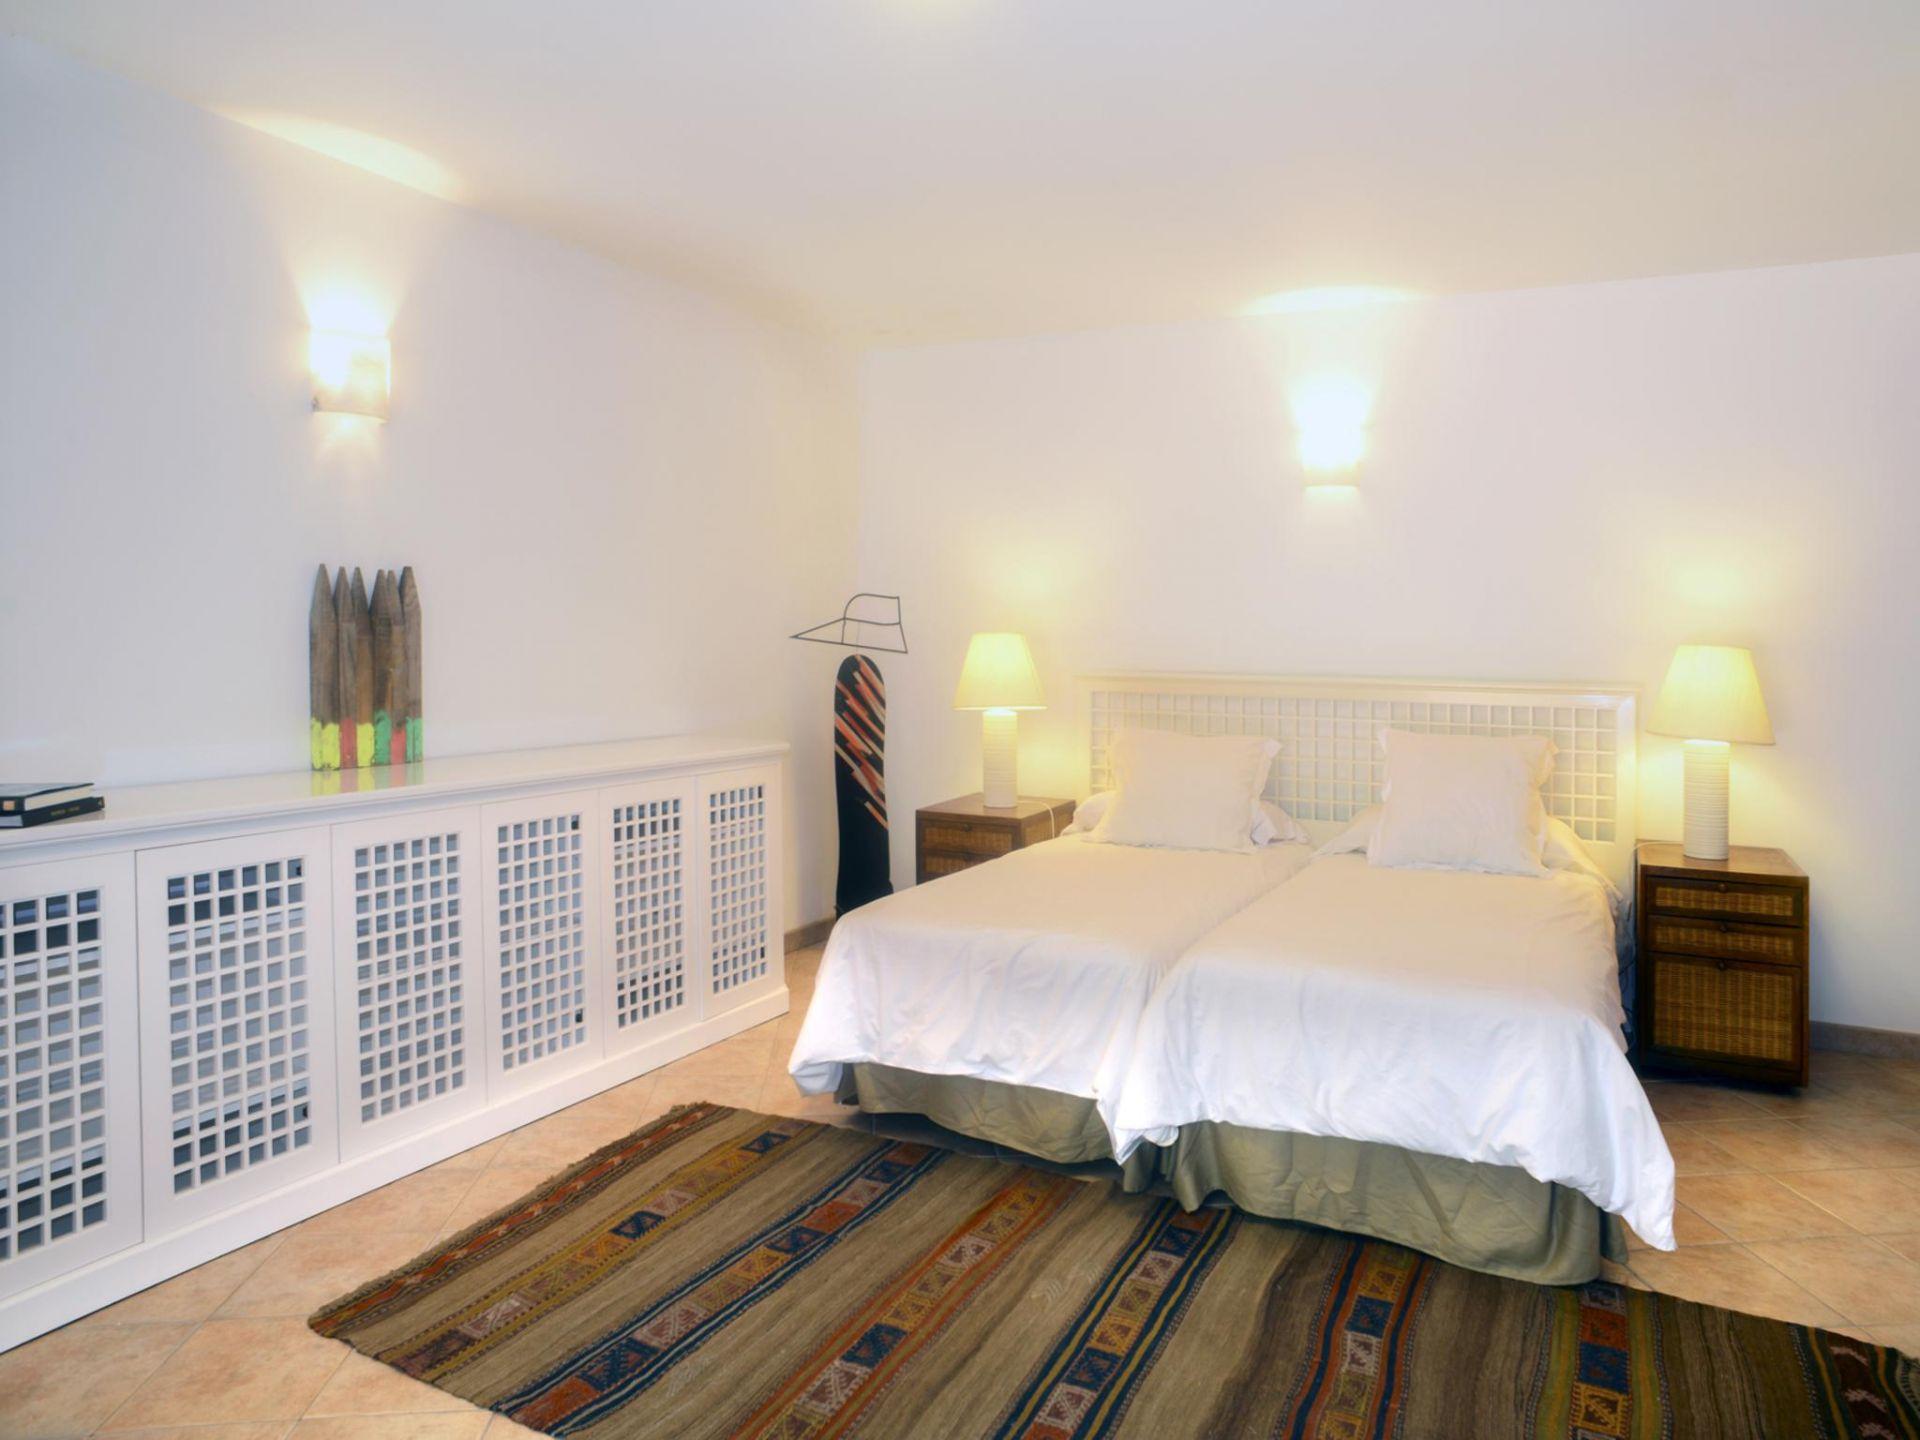 Holiday apartment Villa San Agustin 10 - Holiday Rental (854295), Maspalomas, Gran Canaria, Canary Islands, Spain, picture 25